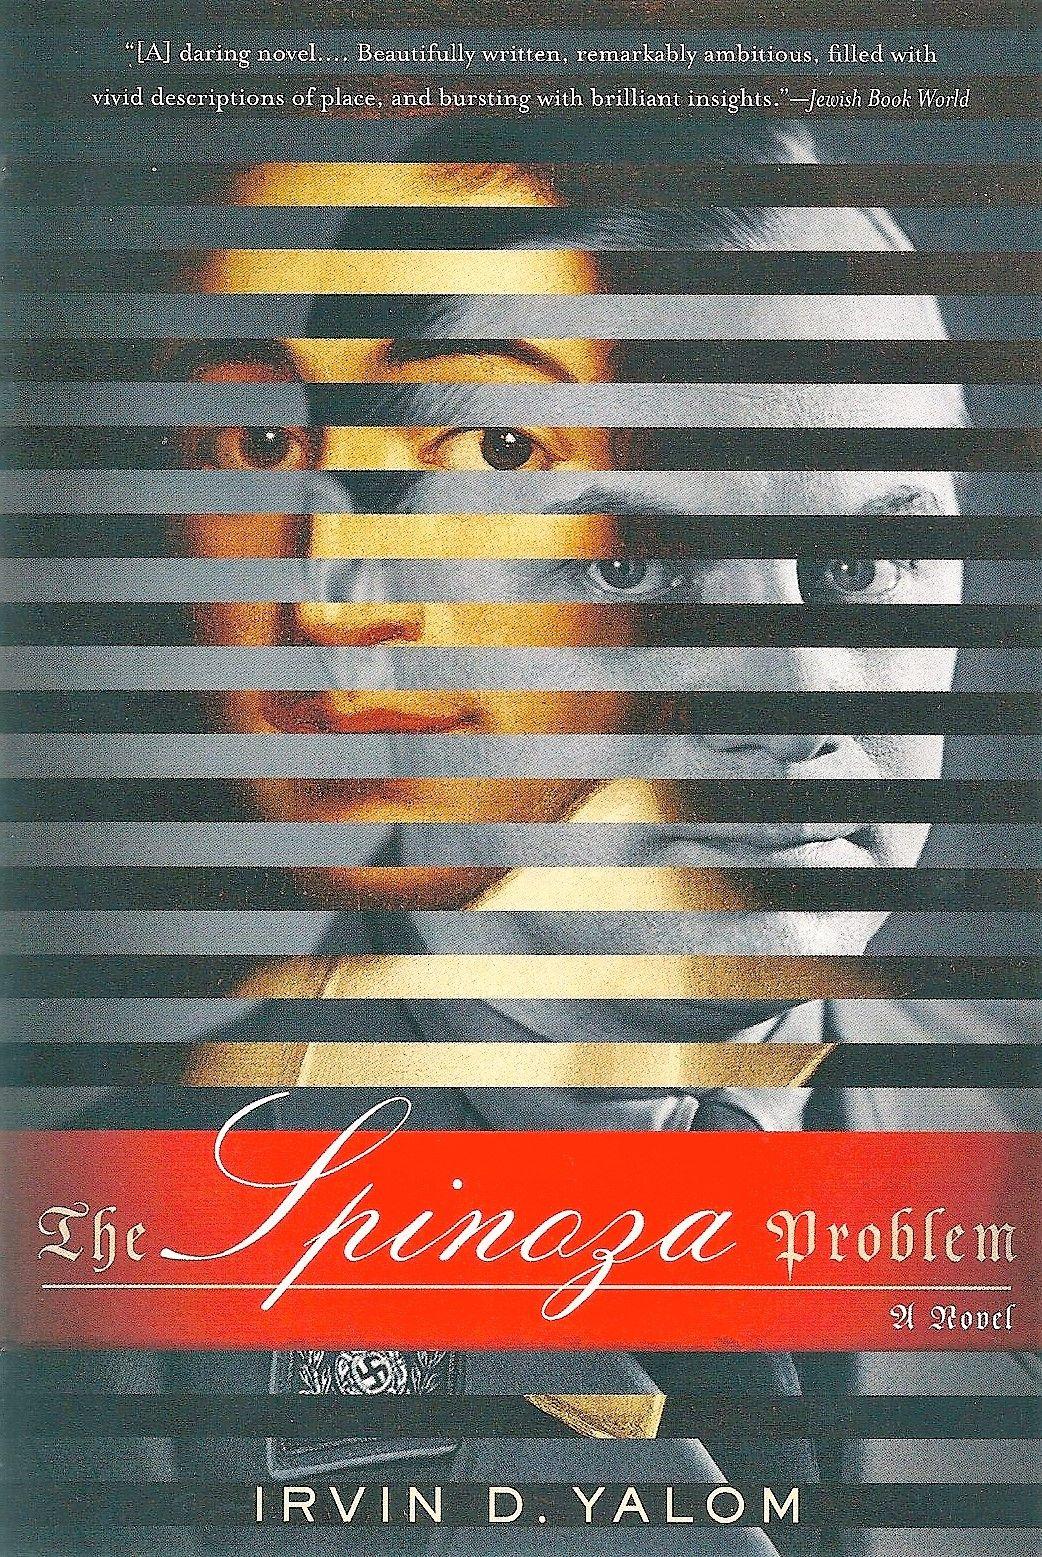 Yalom Irvin D The Spinoza Problem A Novel Basic Books